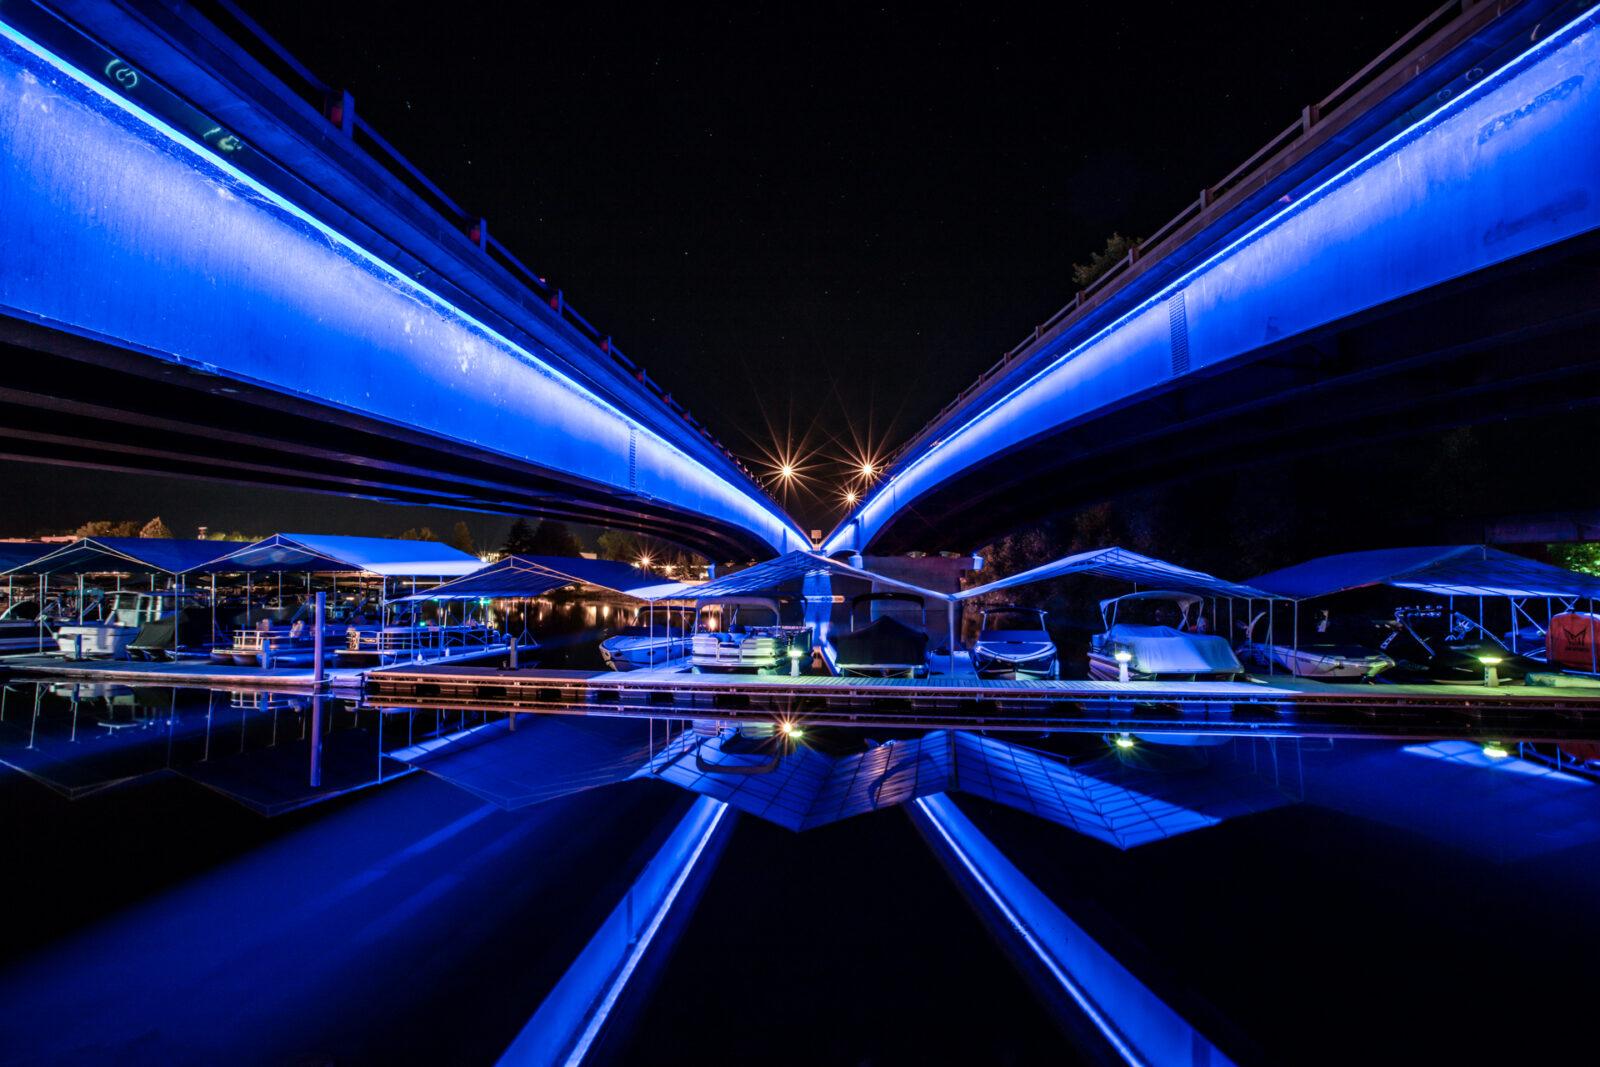 Lights Under the Bridge 2017